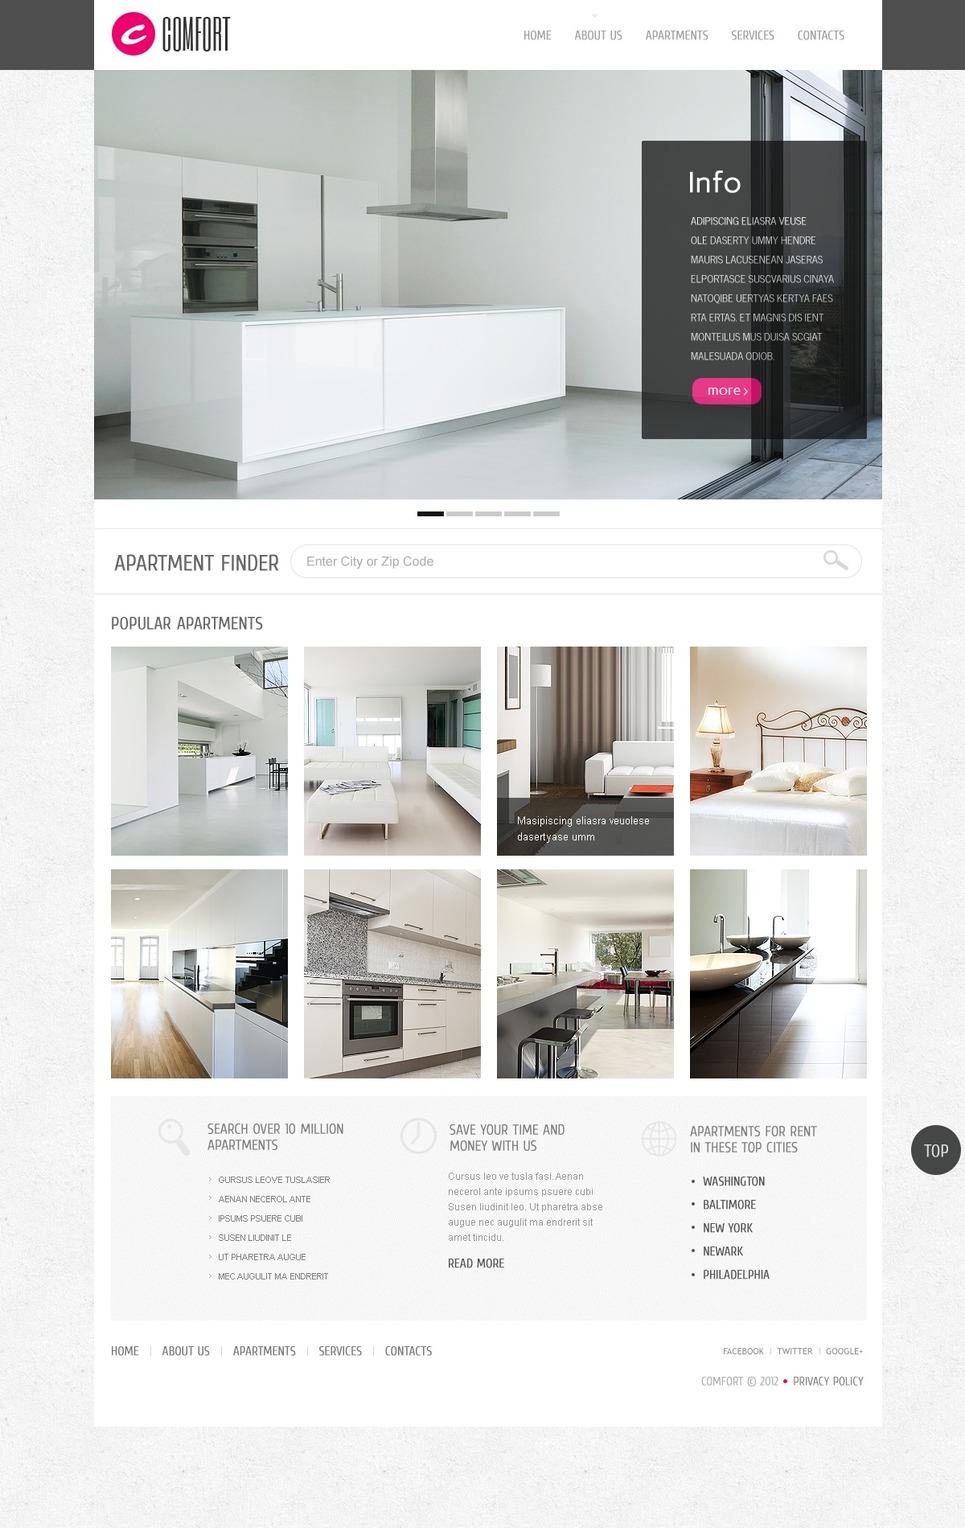 Real Estate Agency WordPress Theme New Screenshots BIG